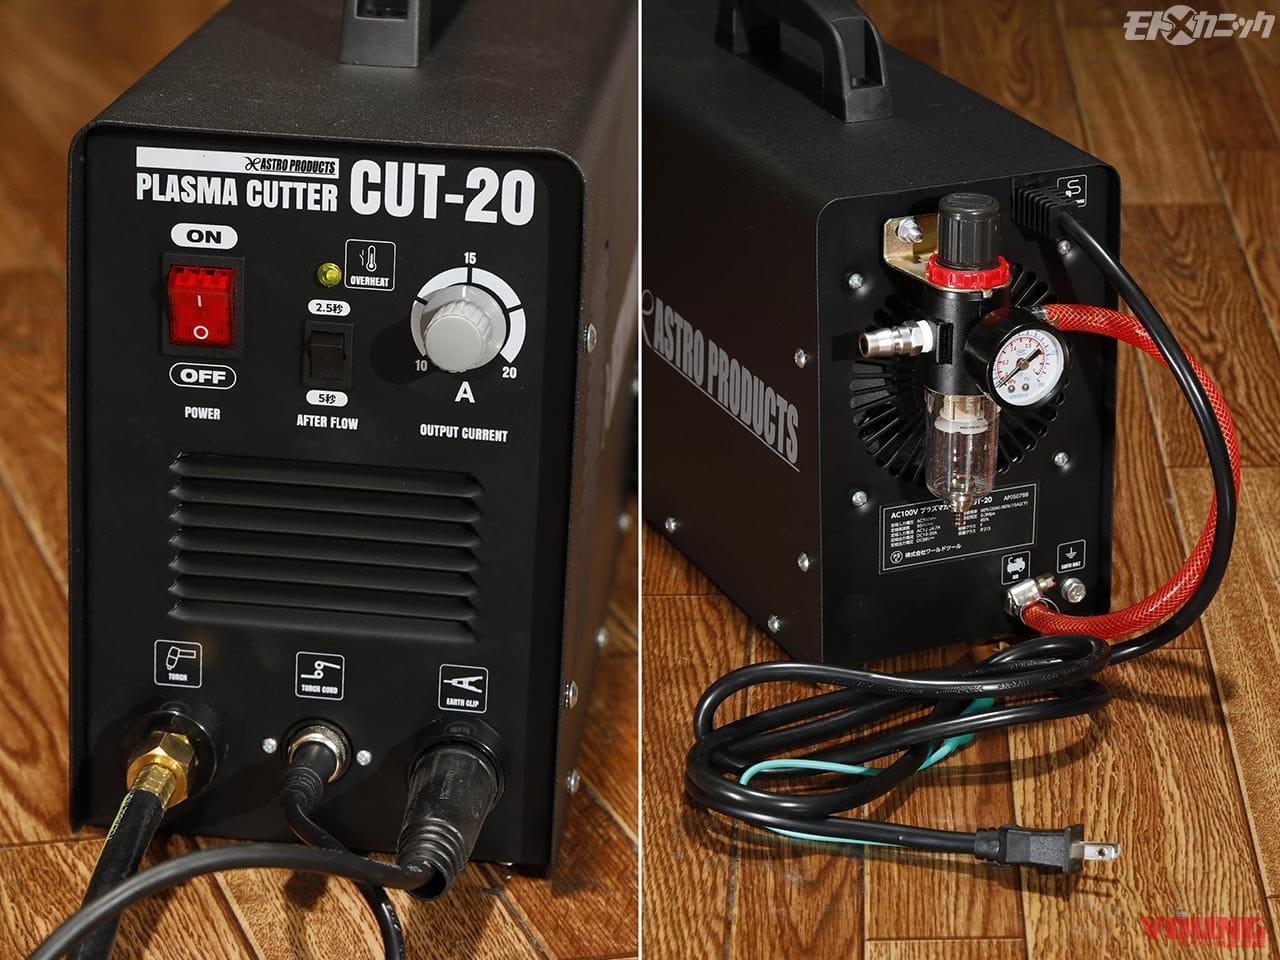 AP AC100Vプラズマカッター CUT-20[アストロプロダクツ]